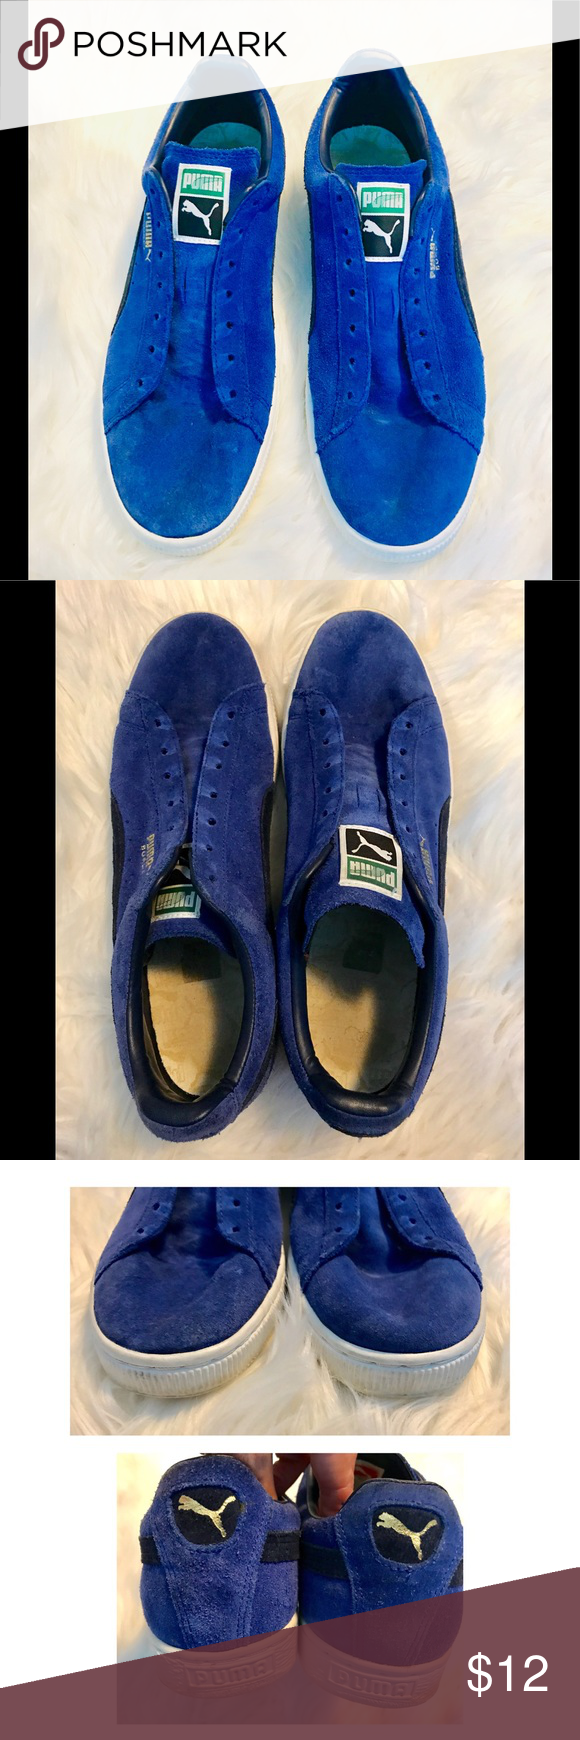 Puma Athletic Shoes Blue Suede No Laces No Rips Mild Wear No Laces Smoke Free Home Puma Shoes Athletic Shoes Blue Shoes Blue Suede Athletic Shoes